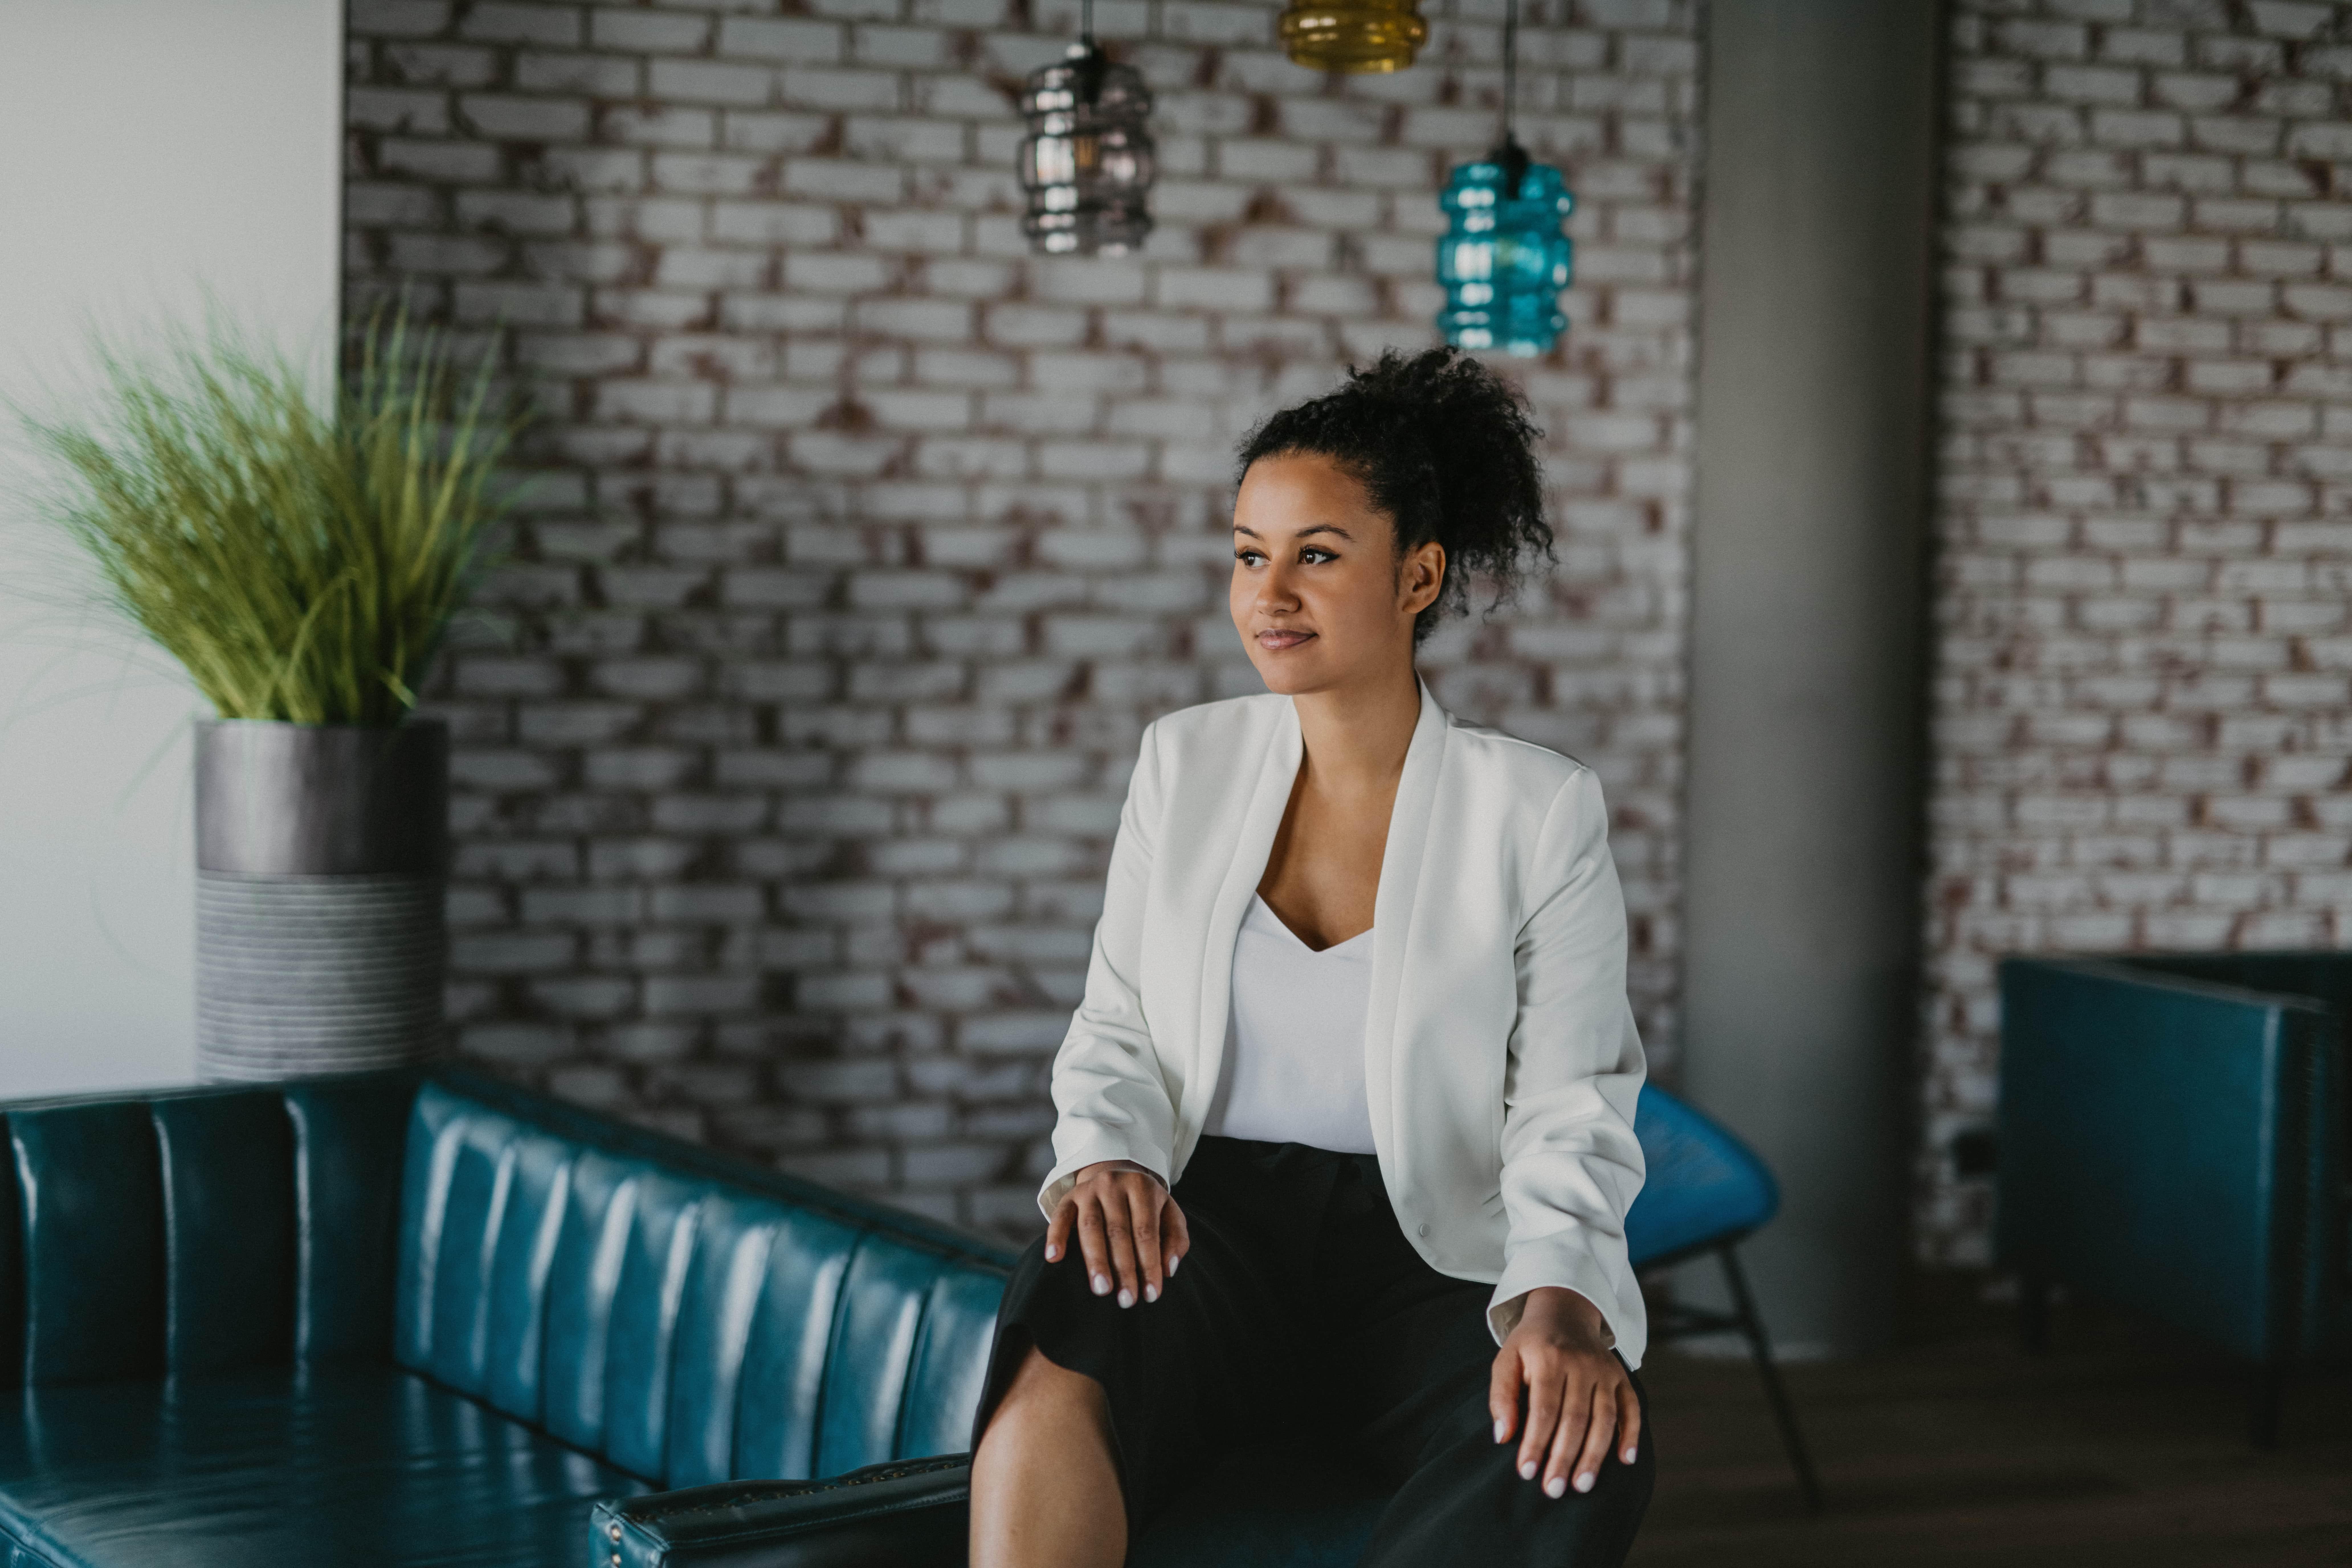 Karin Fuentesová Ceo Digitoo V Rozhovoru Pro Worklounge